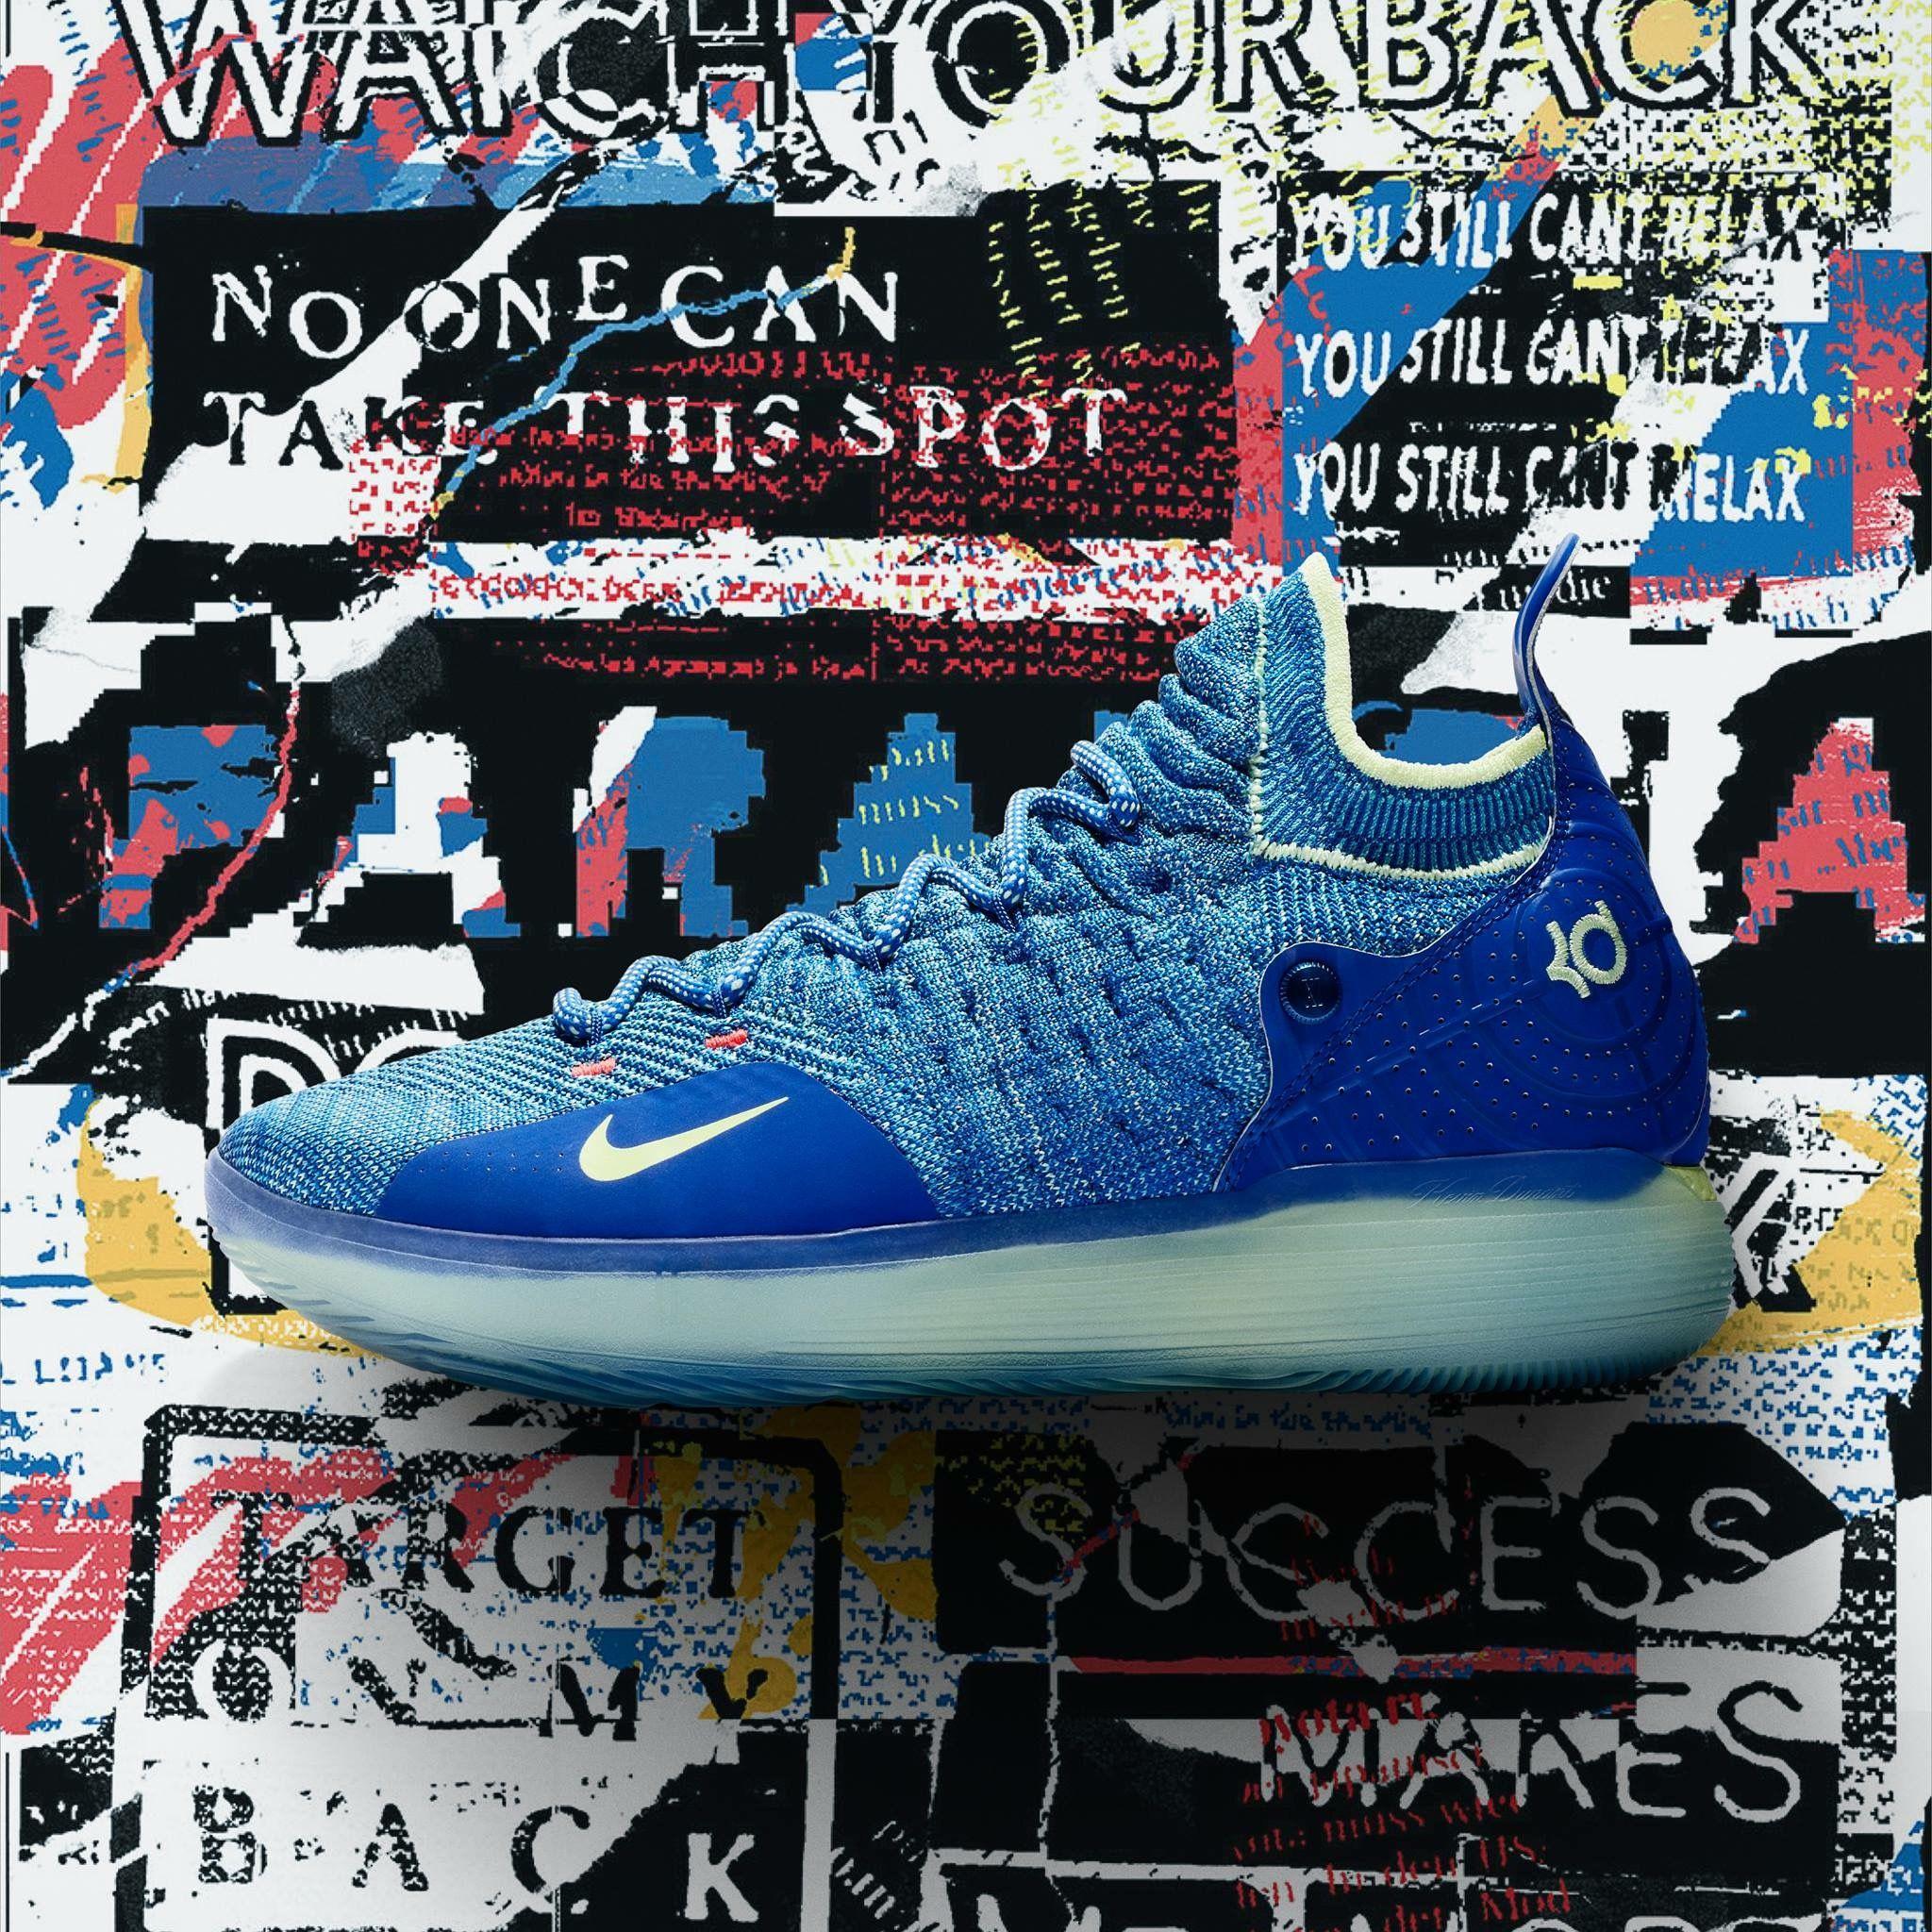 Nike KD 11 | Foot locker, Sneakers nike